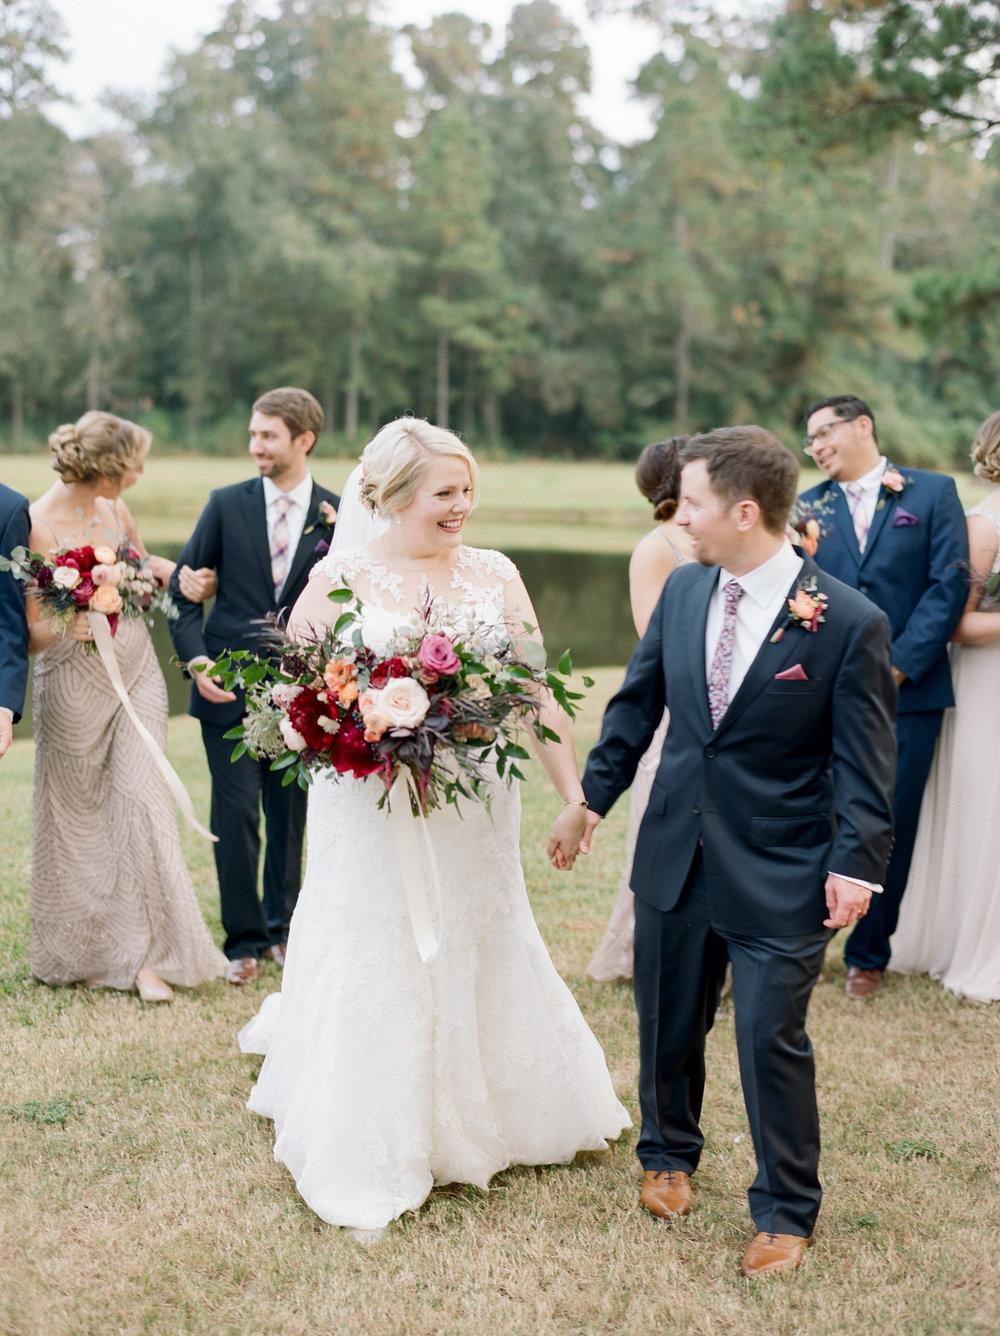 Houston-Wedding-Photographer-Fine-Art-Film-Destination-Style-Me-Pretty-Austin-Dallas-New-Orleans-Dana-Fernandez-Photography-The Woodlands-Country-Club-10.jpg